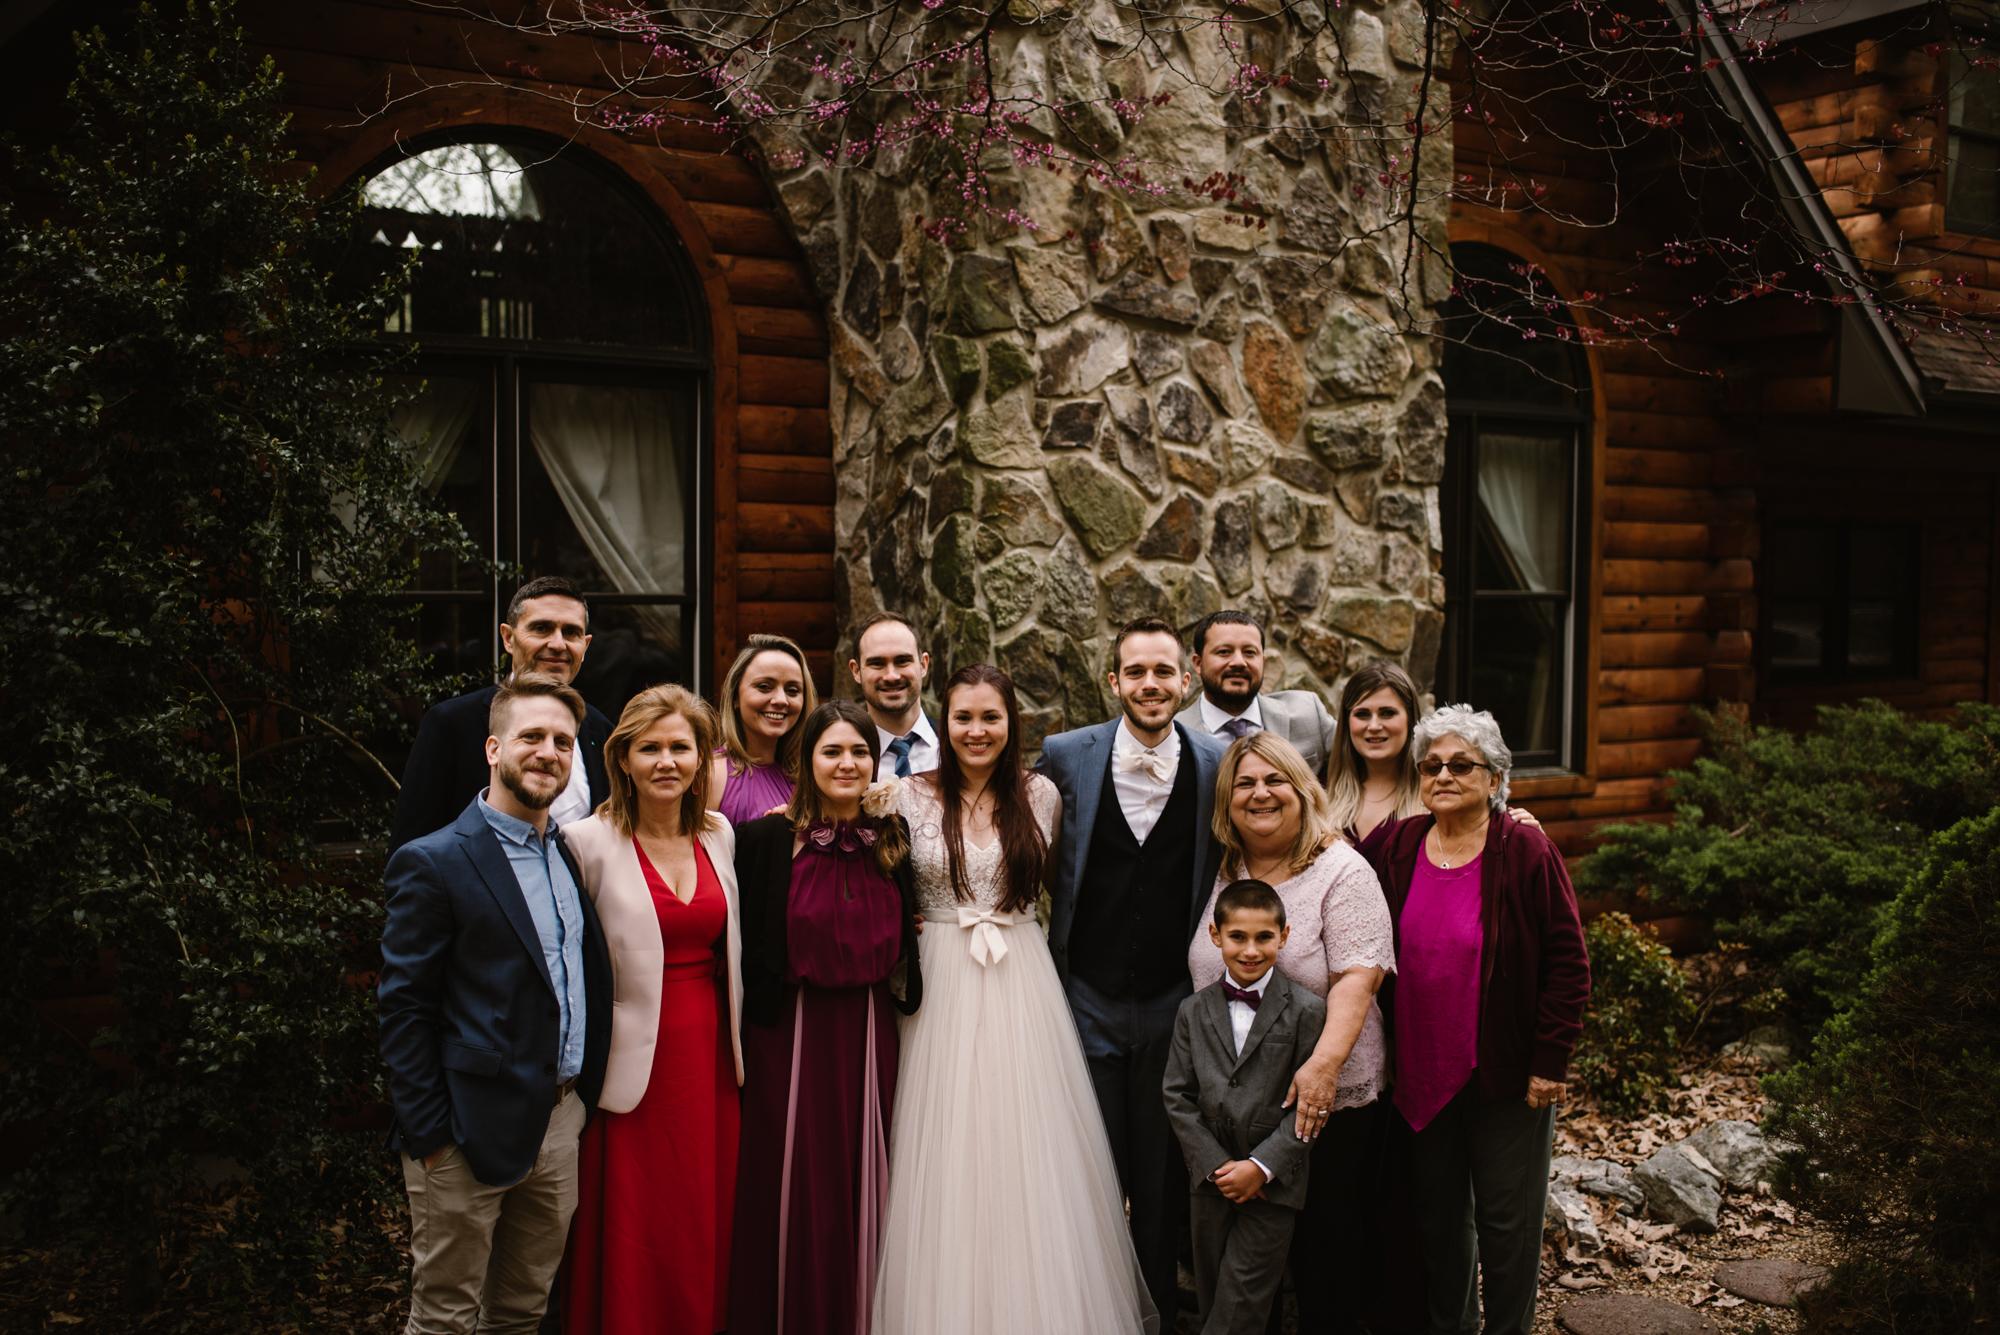 Paula and Andrew - Small Adventurous Wedding in Shenandoah National Park - Blue Ridge Mountain Wedding - White Sails Creative - Mountain Elopement_53.jpg